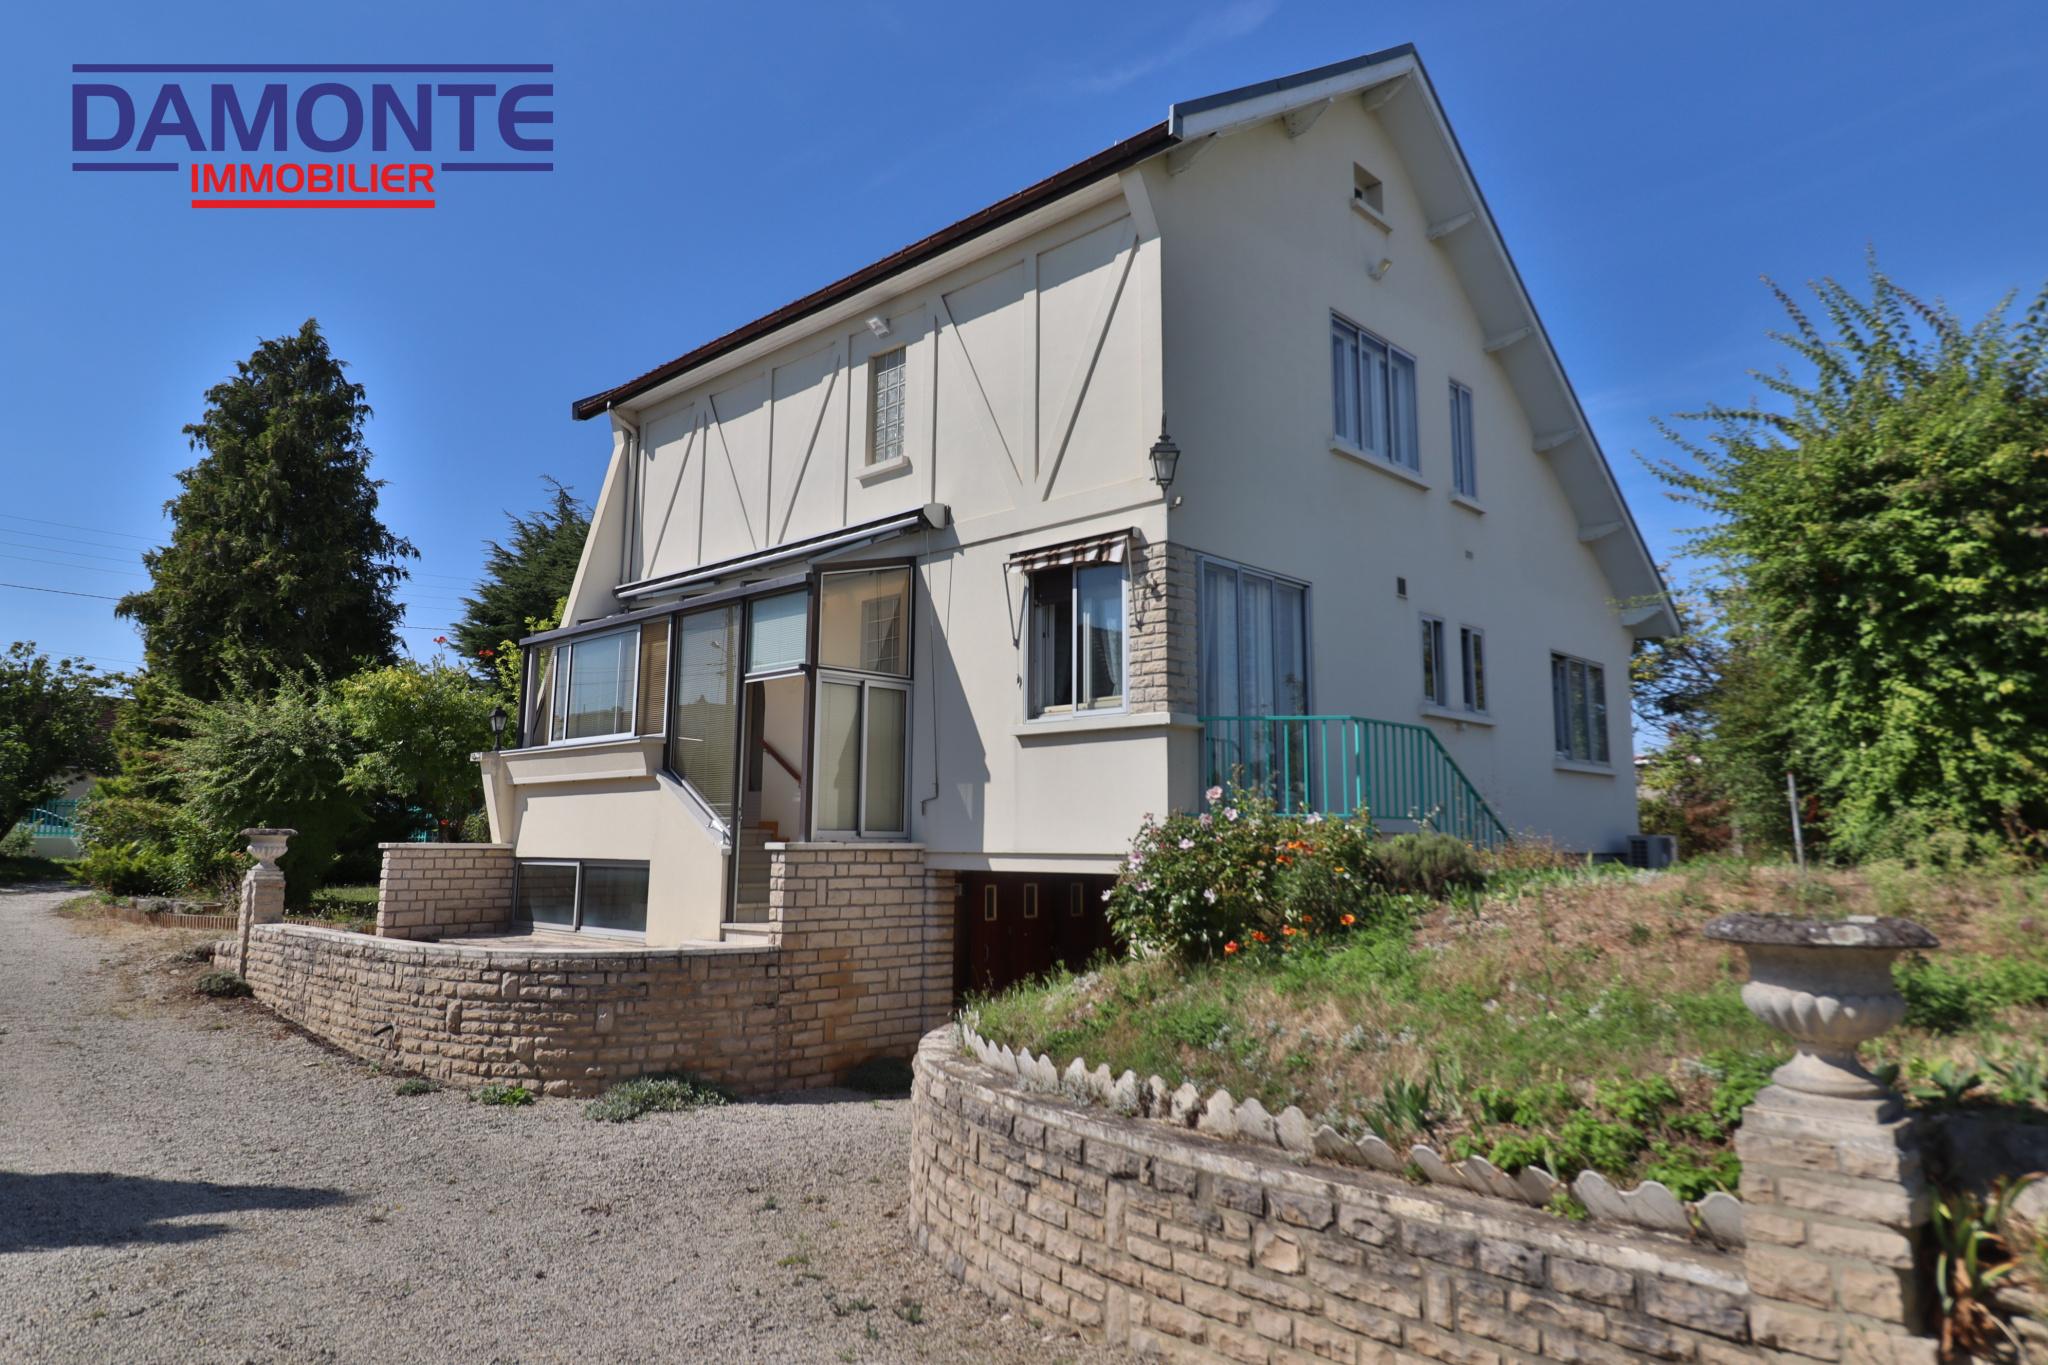 Damonte Achat maison - Réf n° 1_19246